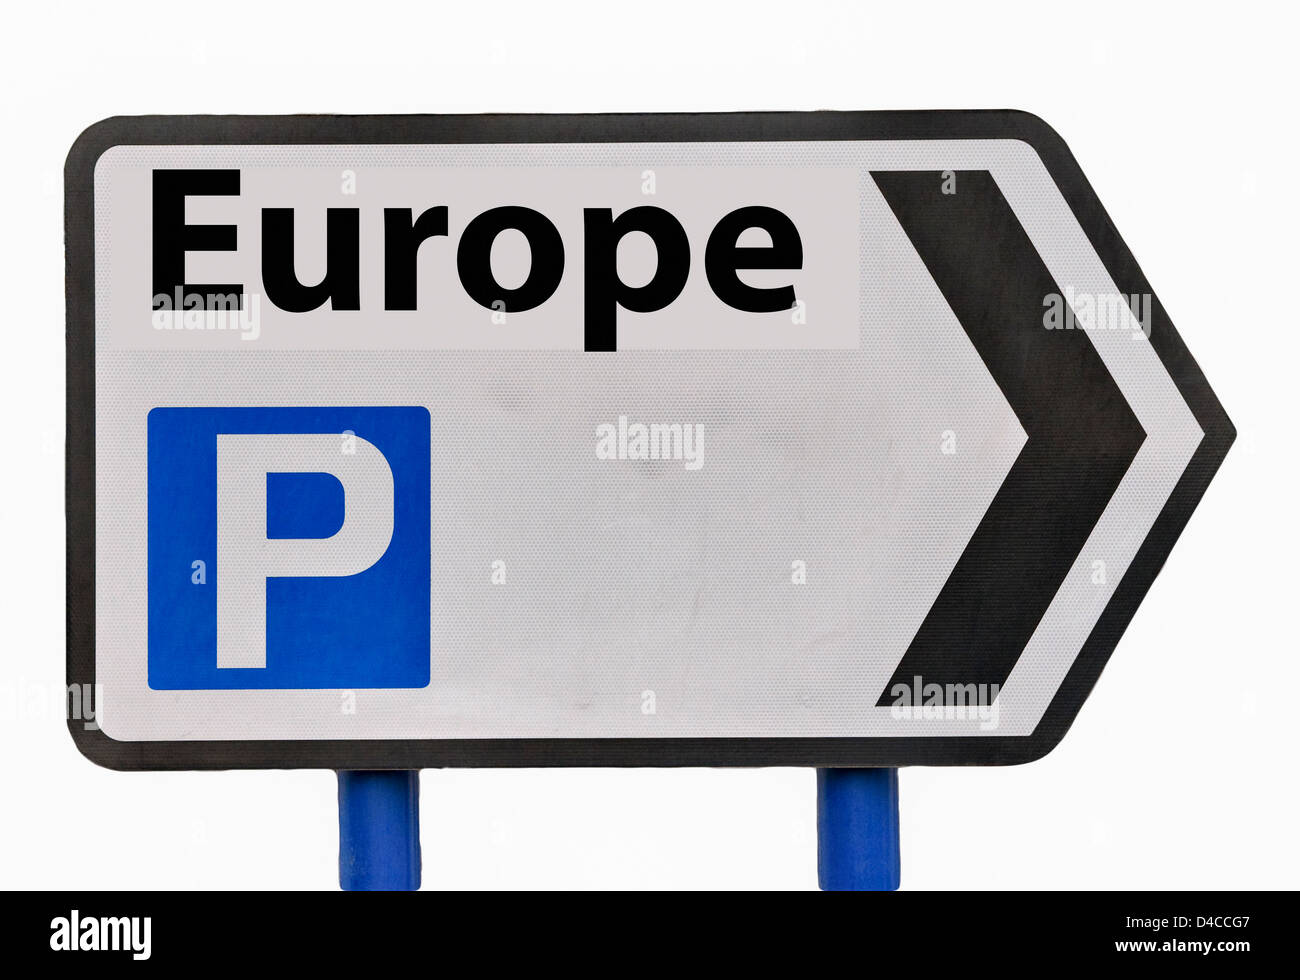 Europe Parking Road Sign England UK - Stock Image